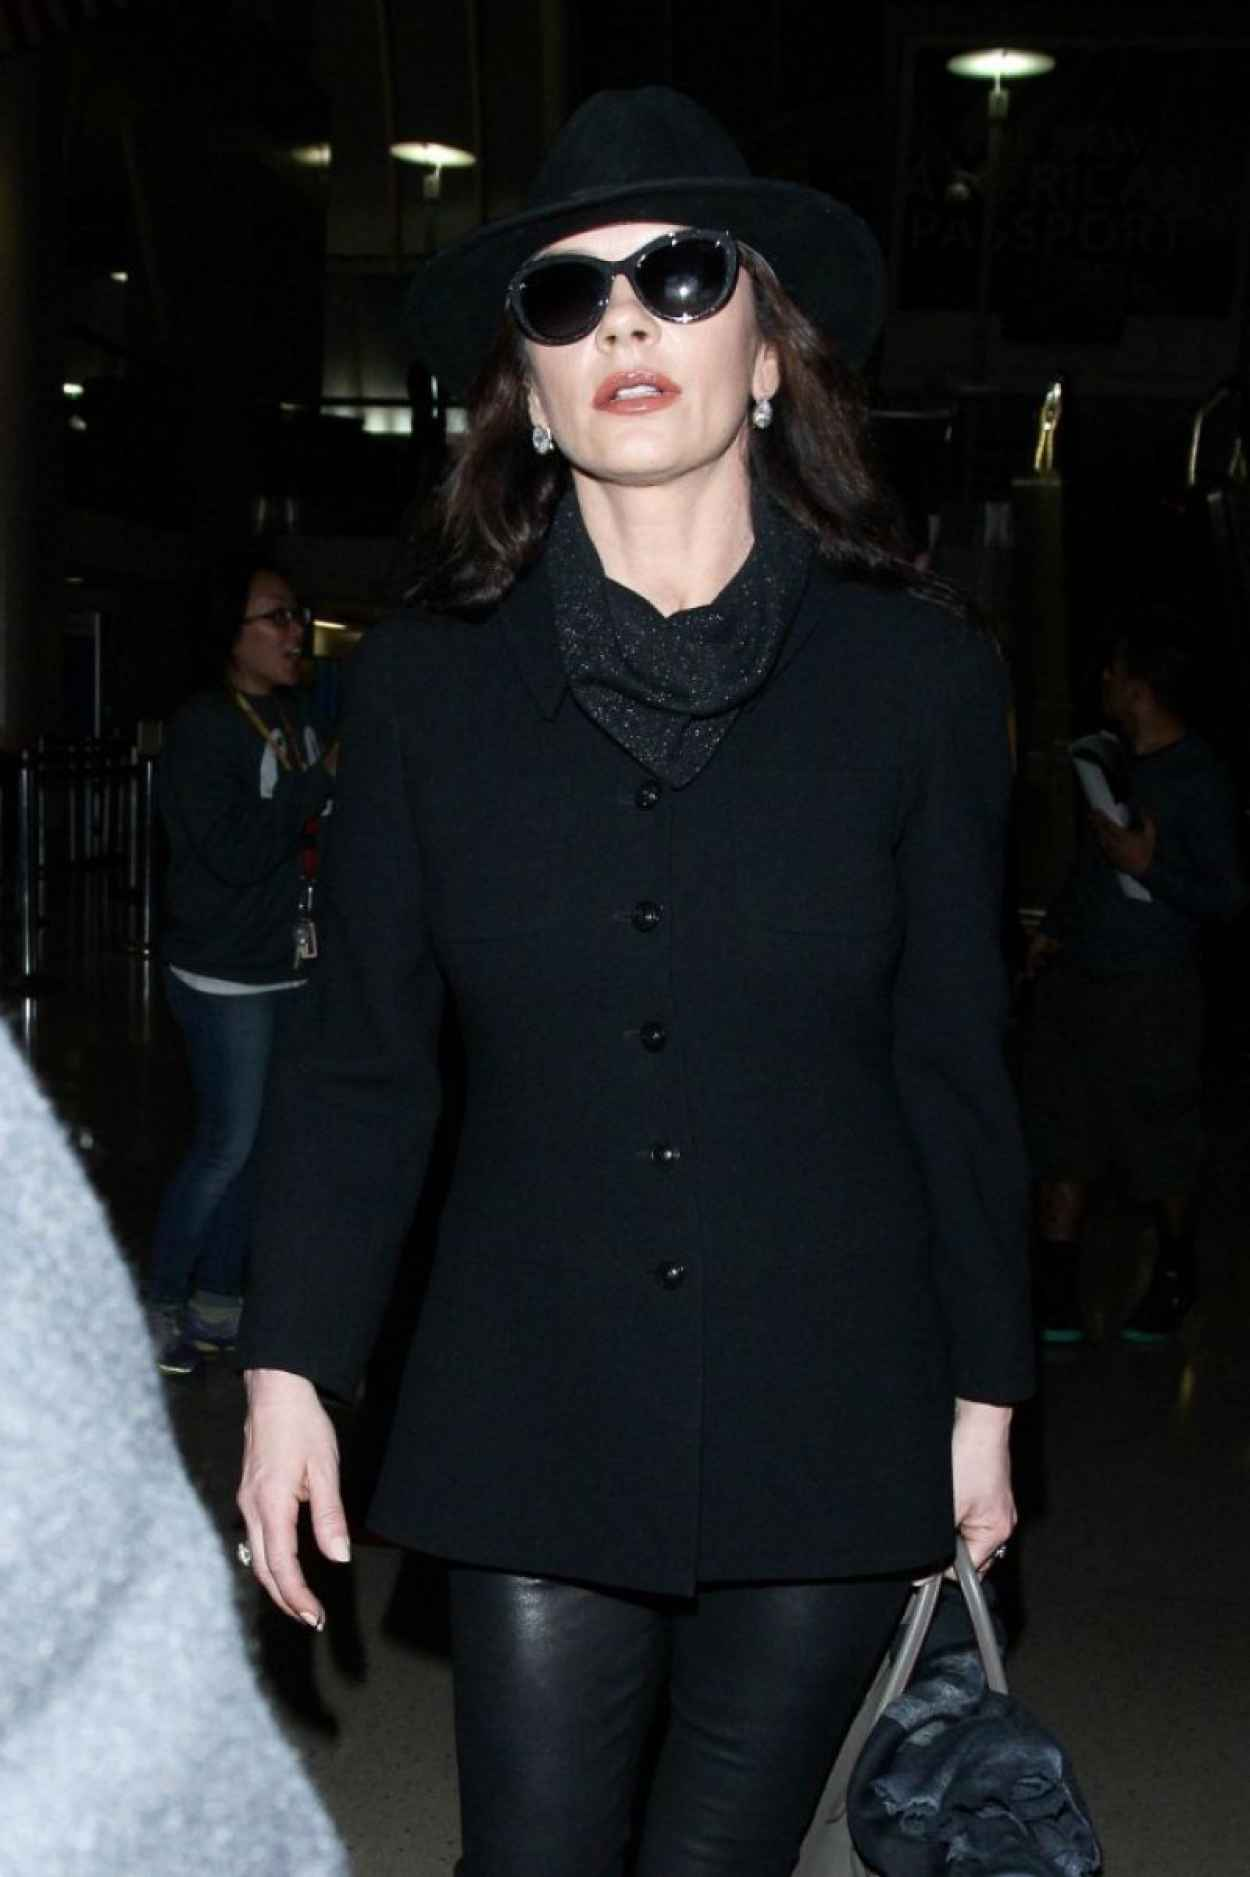 Catherine Zeta Jones - at LAX Airport, January 2015-2